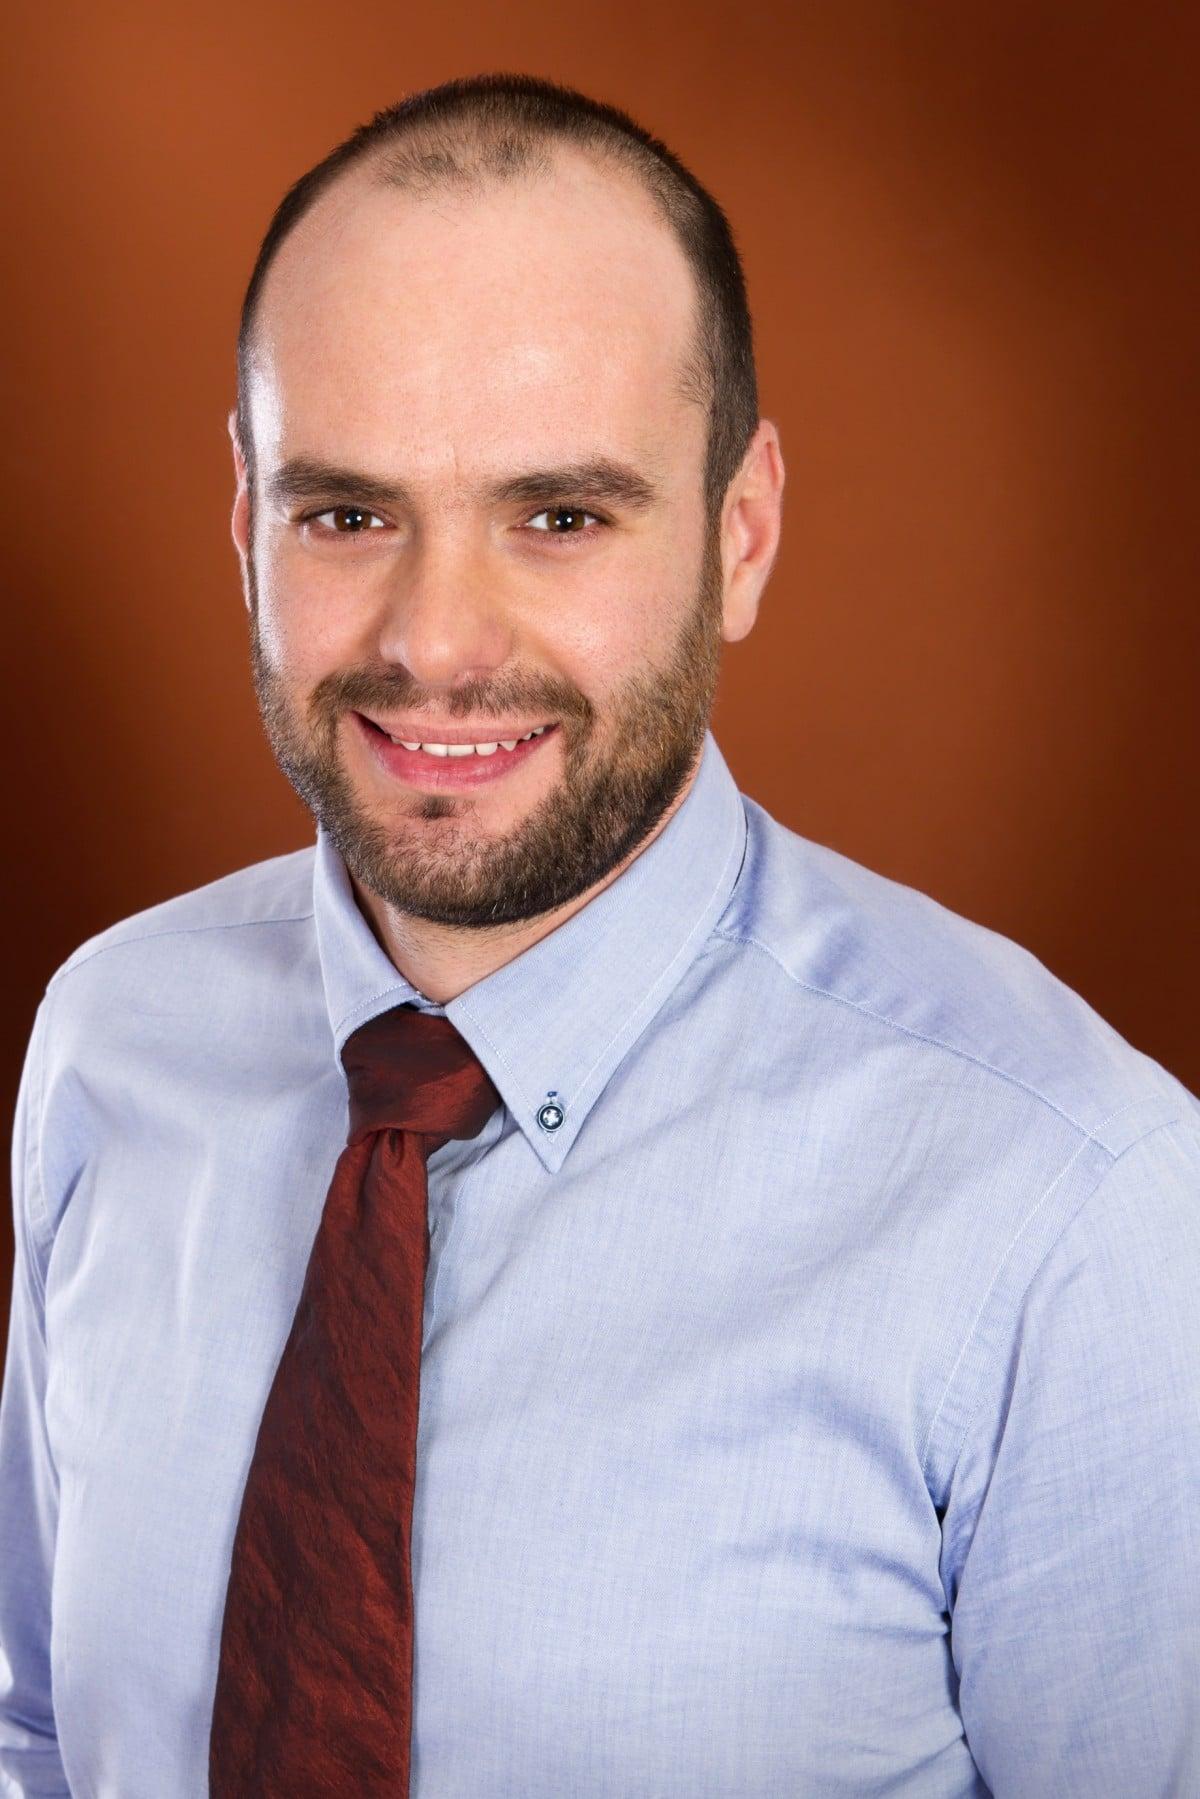 Adrian Blidarus Softelligence